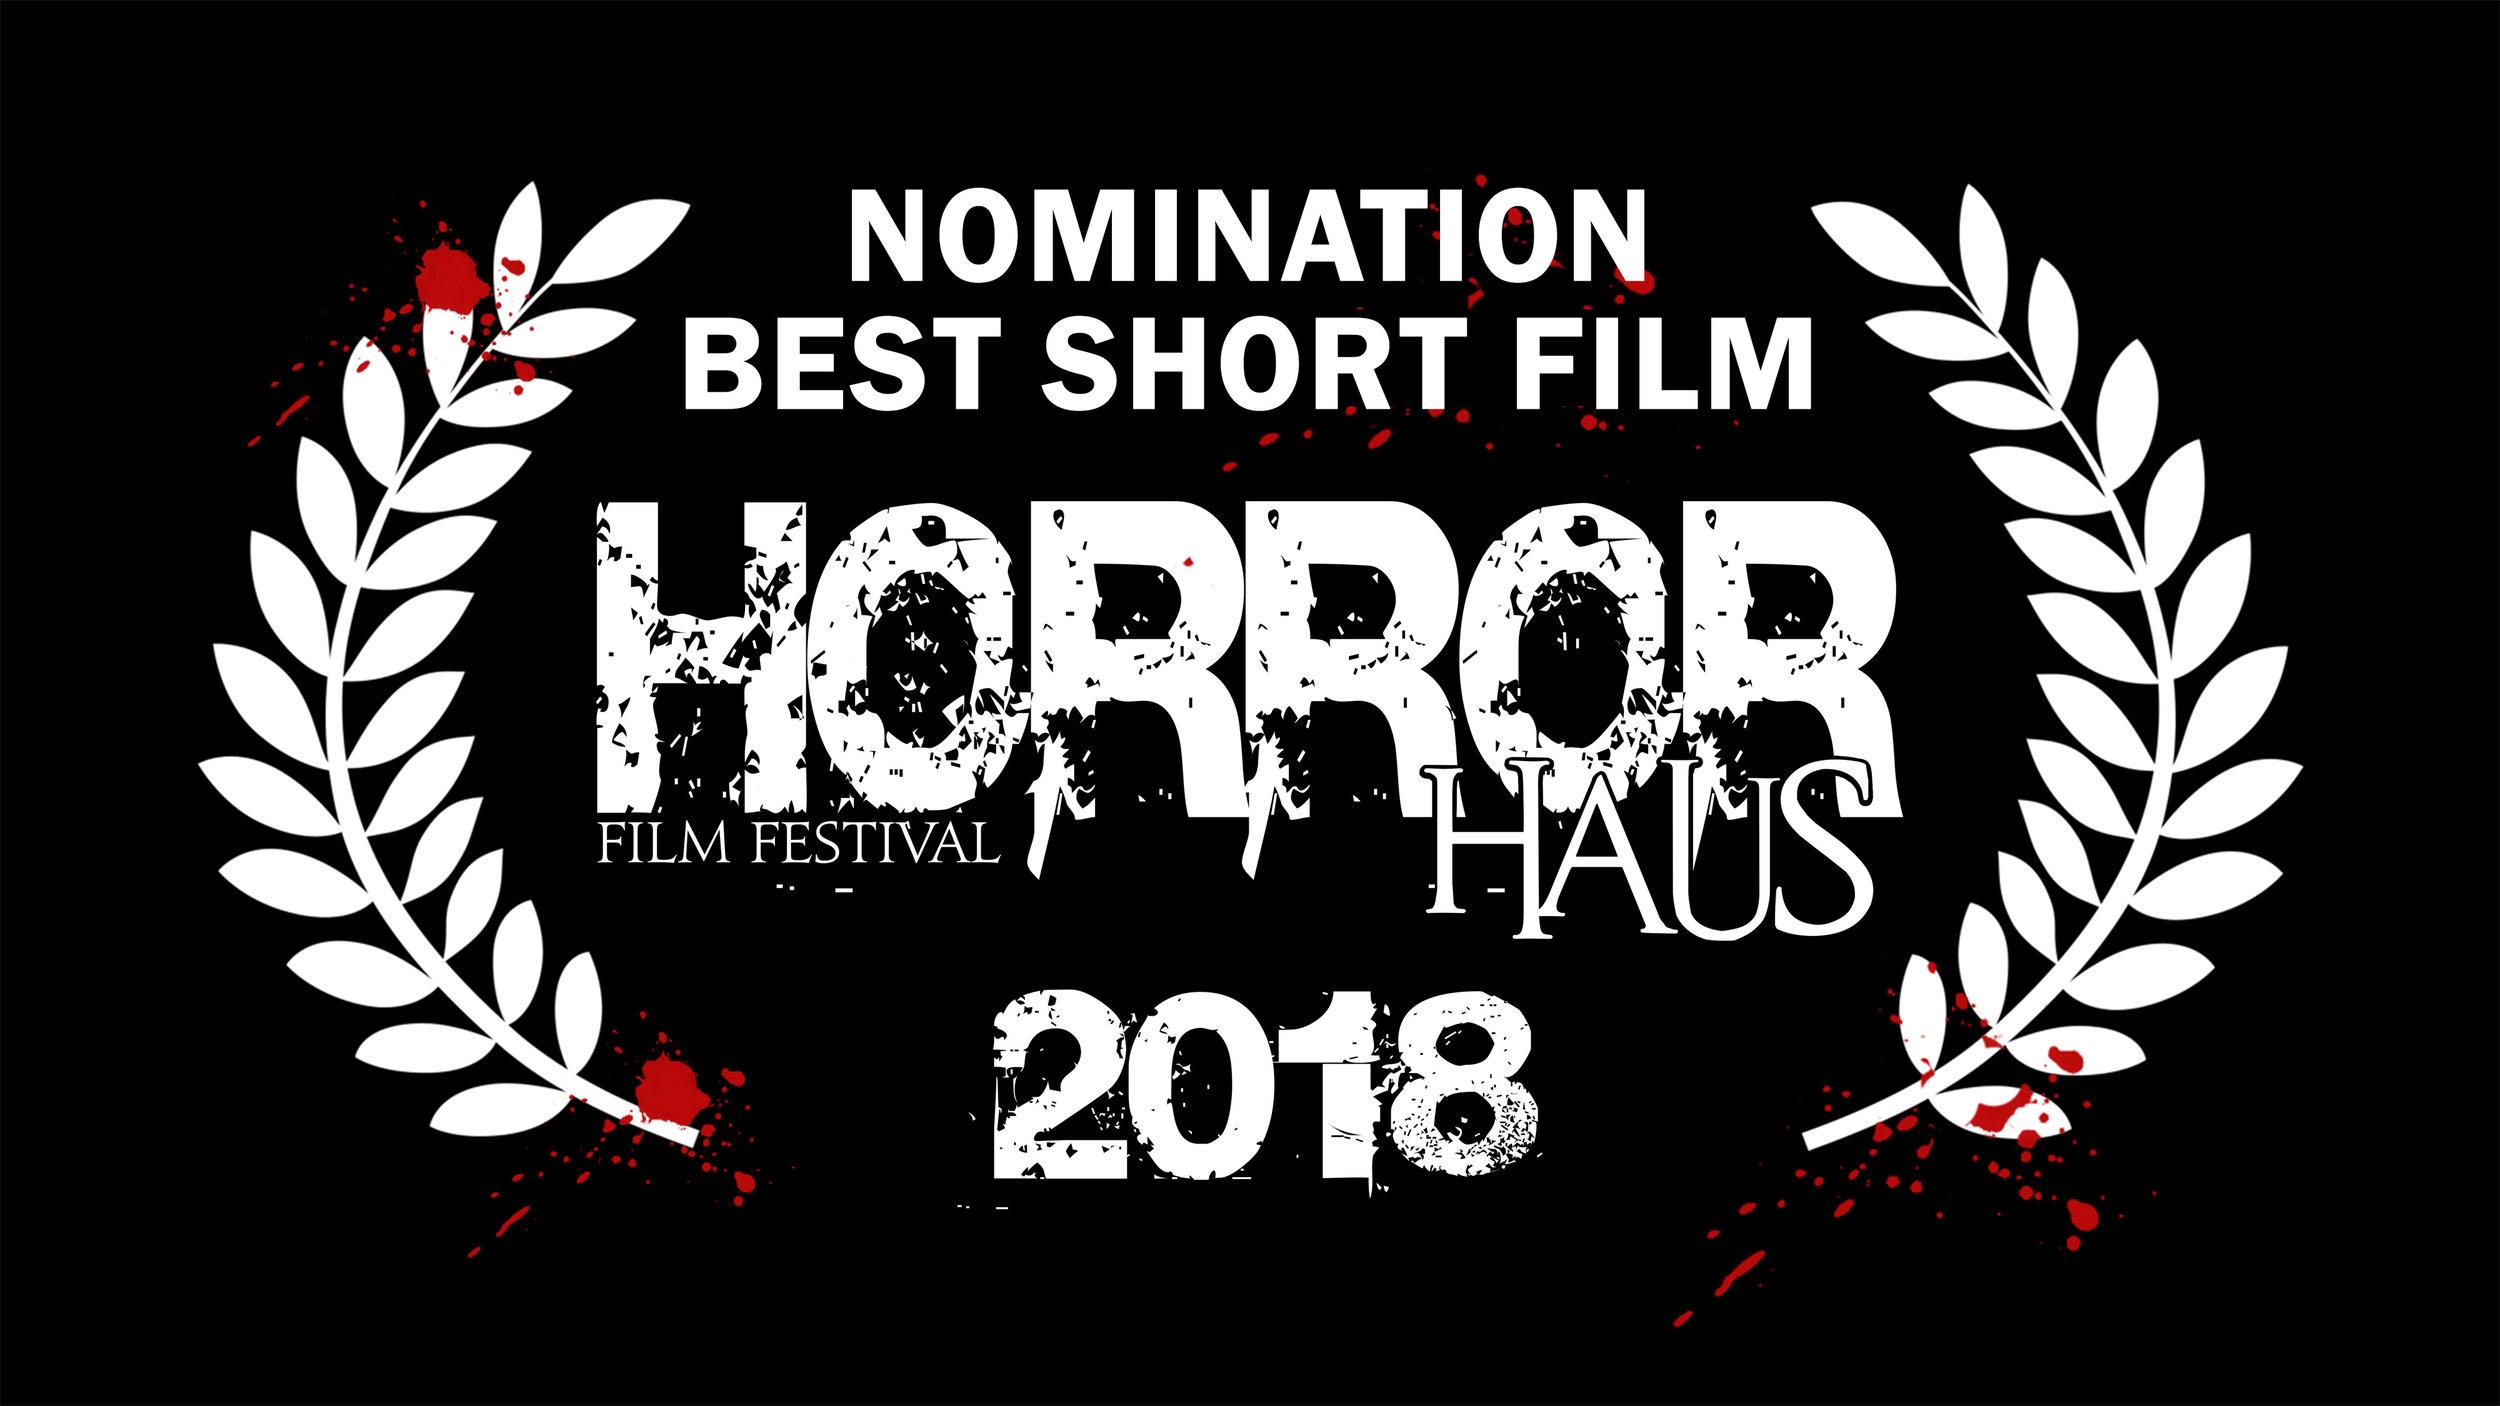 HHFF_Laurel_White_2018 best short film nom jpeg.jpg